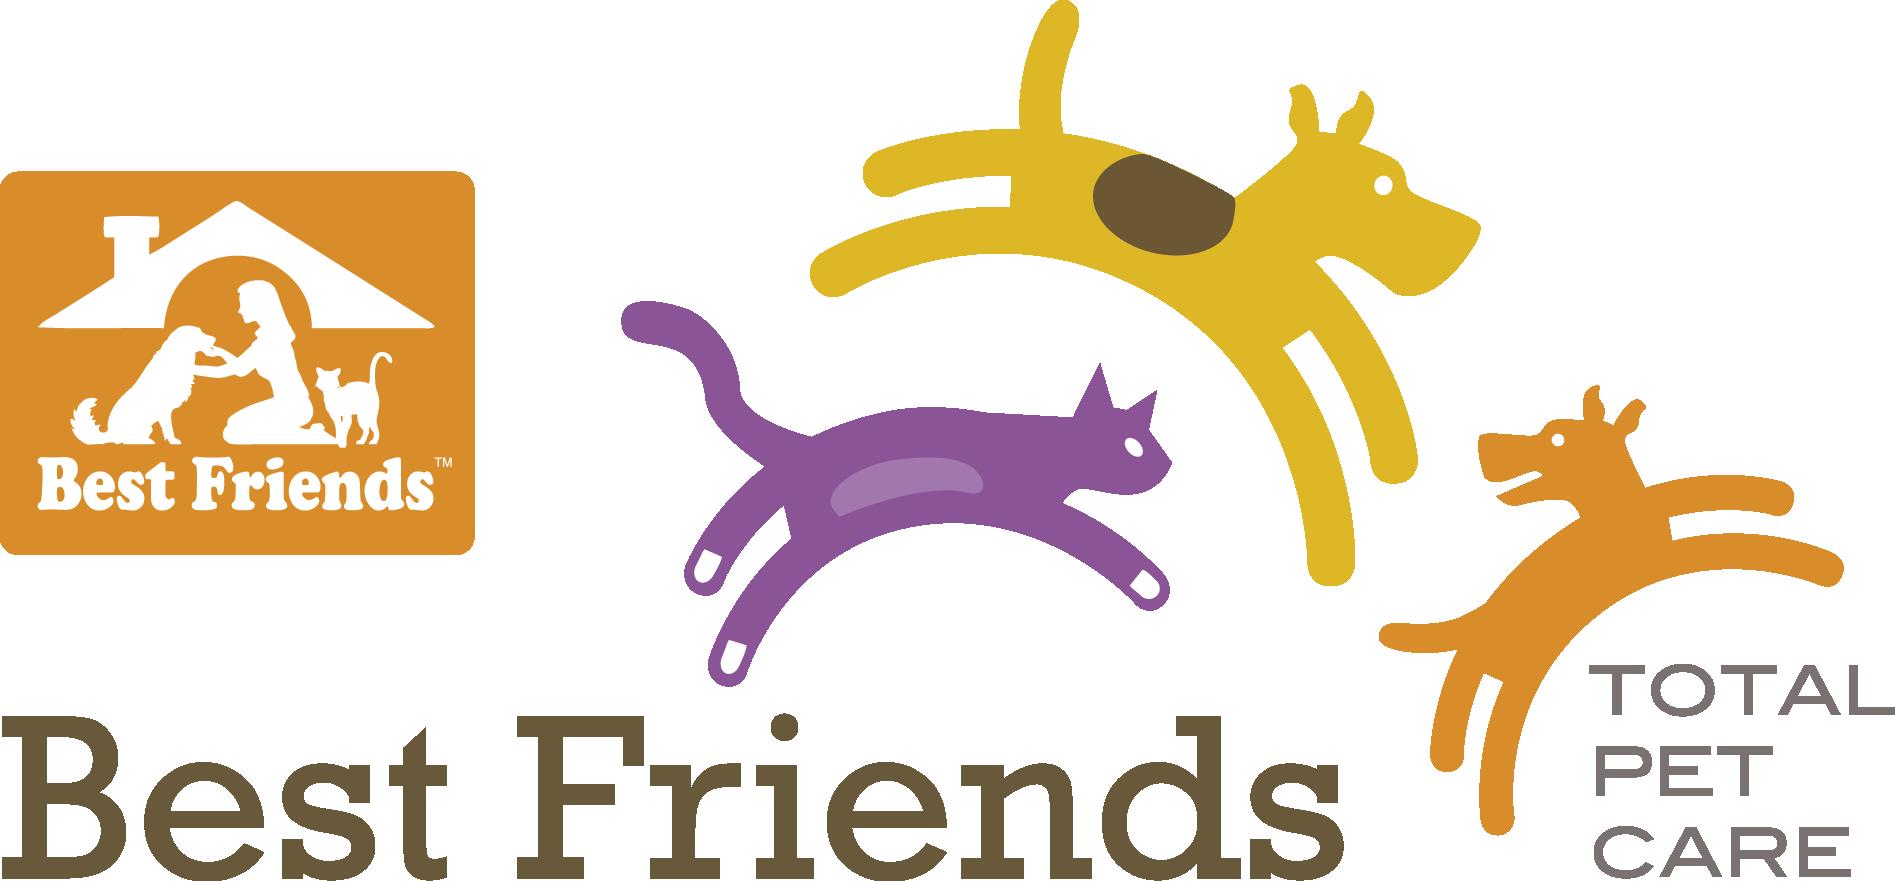 Pet Care Logo חיפוש ב Google Veterinaria Temas Huellas